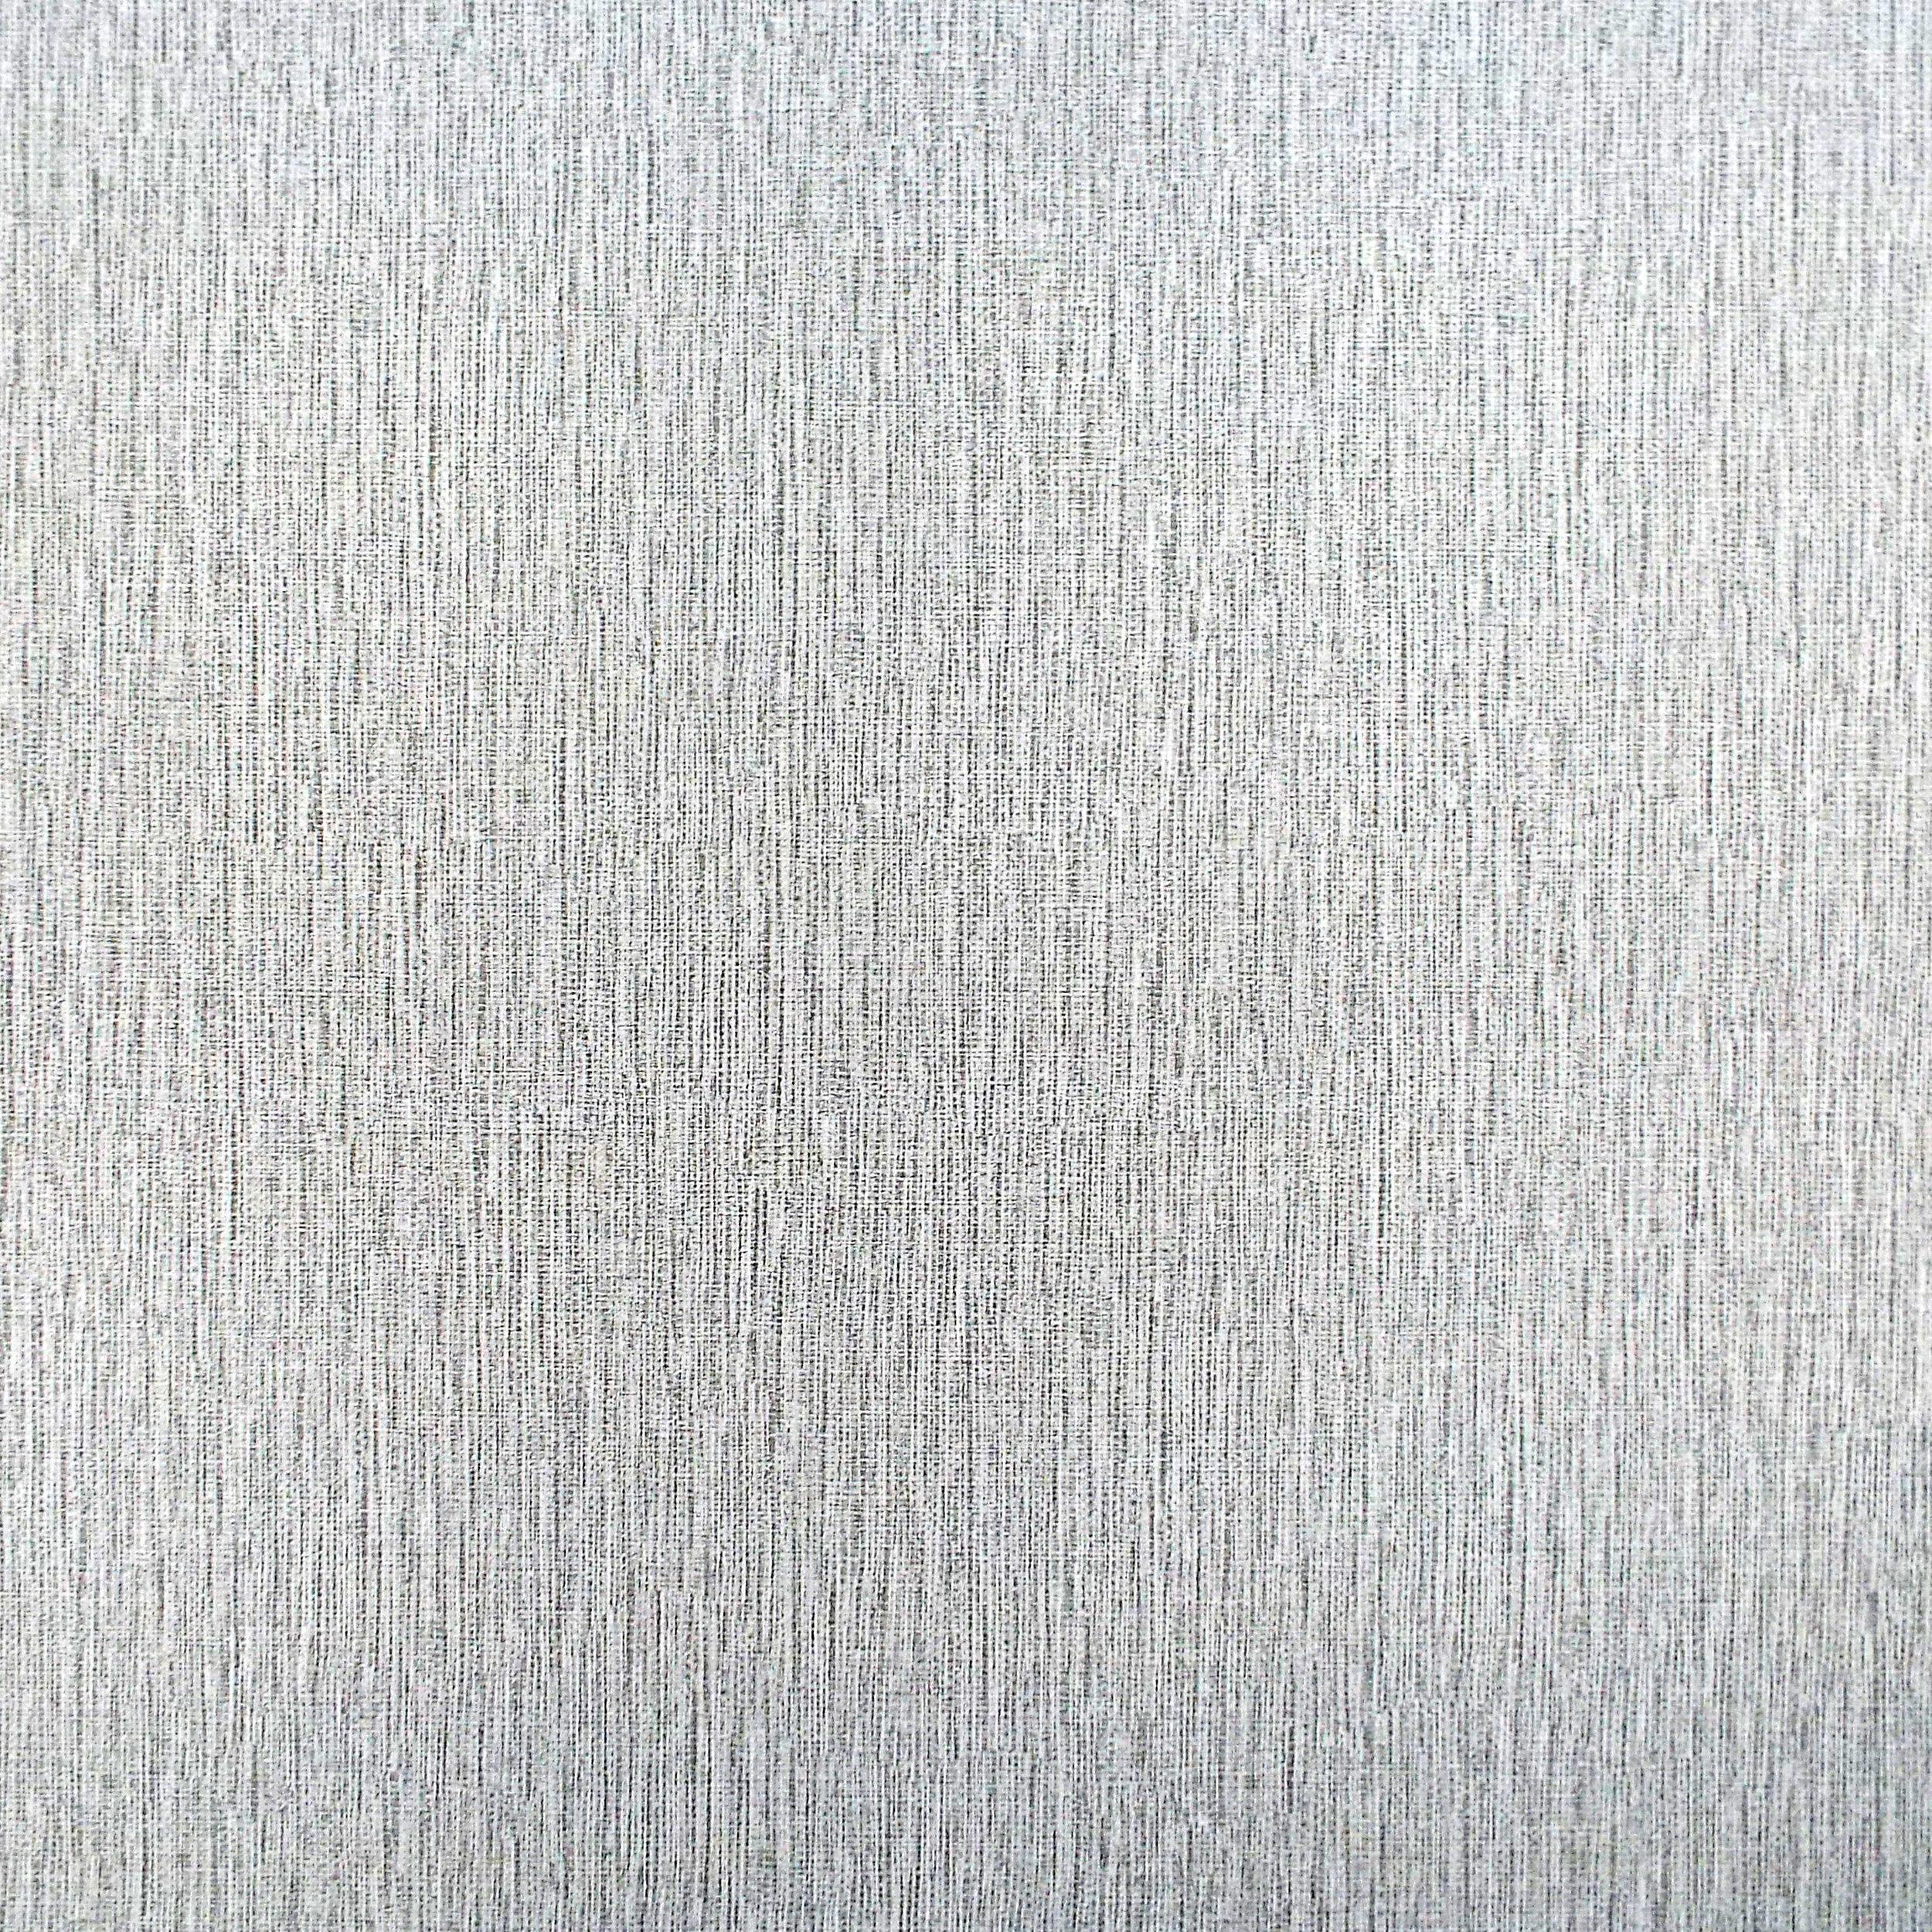 "Tweed - Grey 24""x24""   15.50 SF/CTN  4 PC/CTN  40 CTN/PLT"